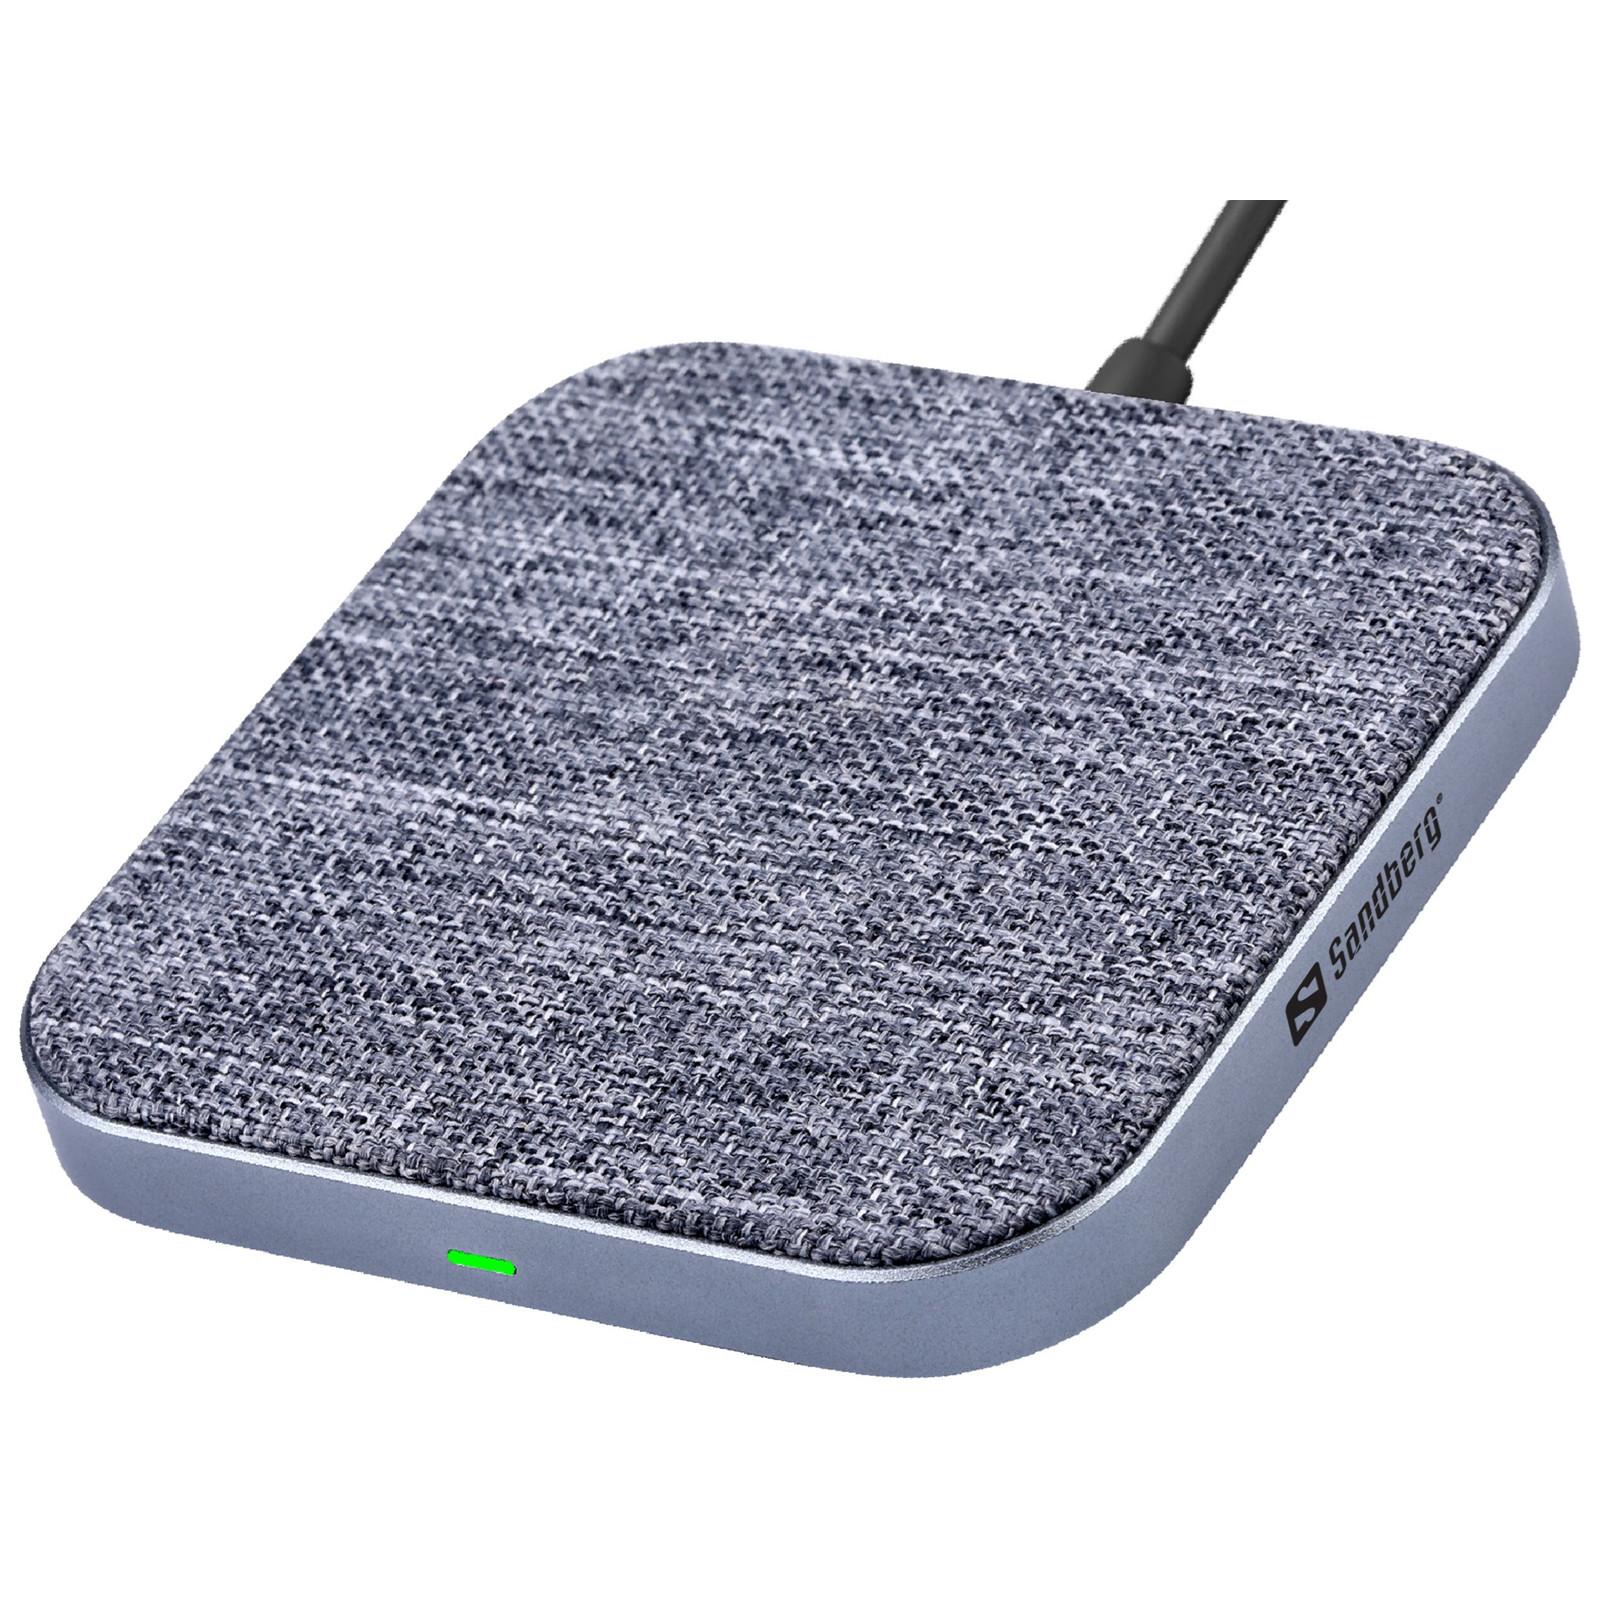 Sandberg Wireless Charger Pad 15W